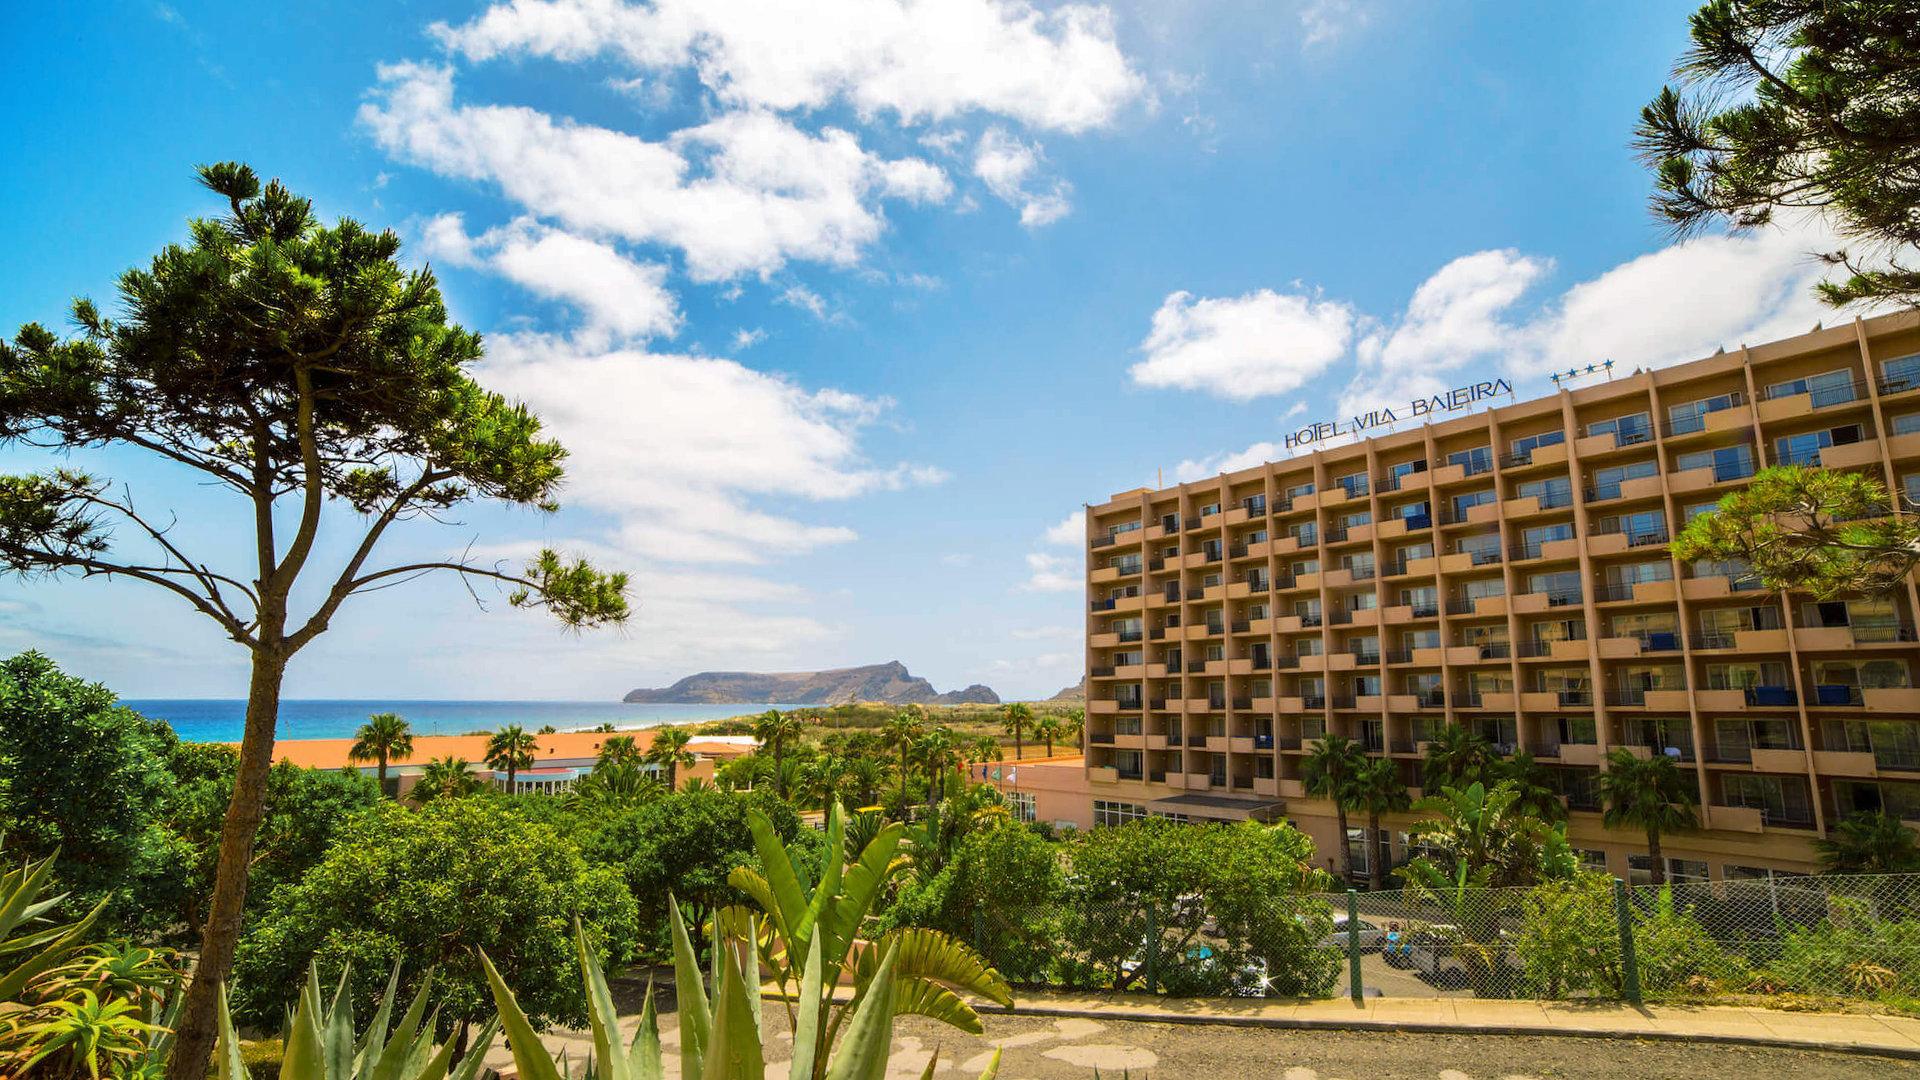 Hotel Vila Baleira Resort & Thalasso Spa